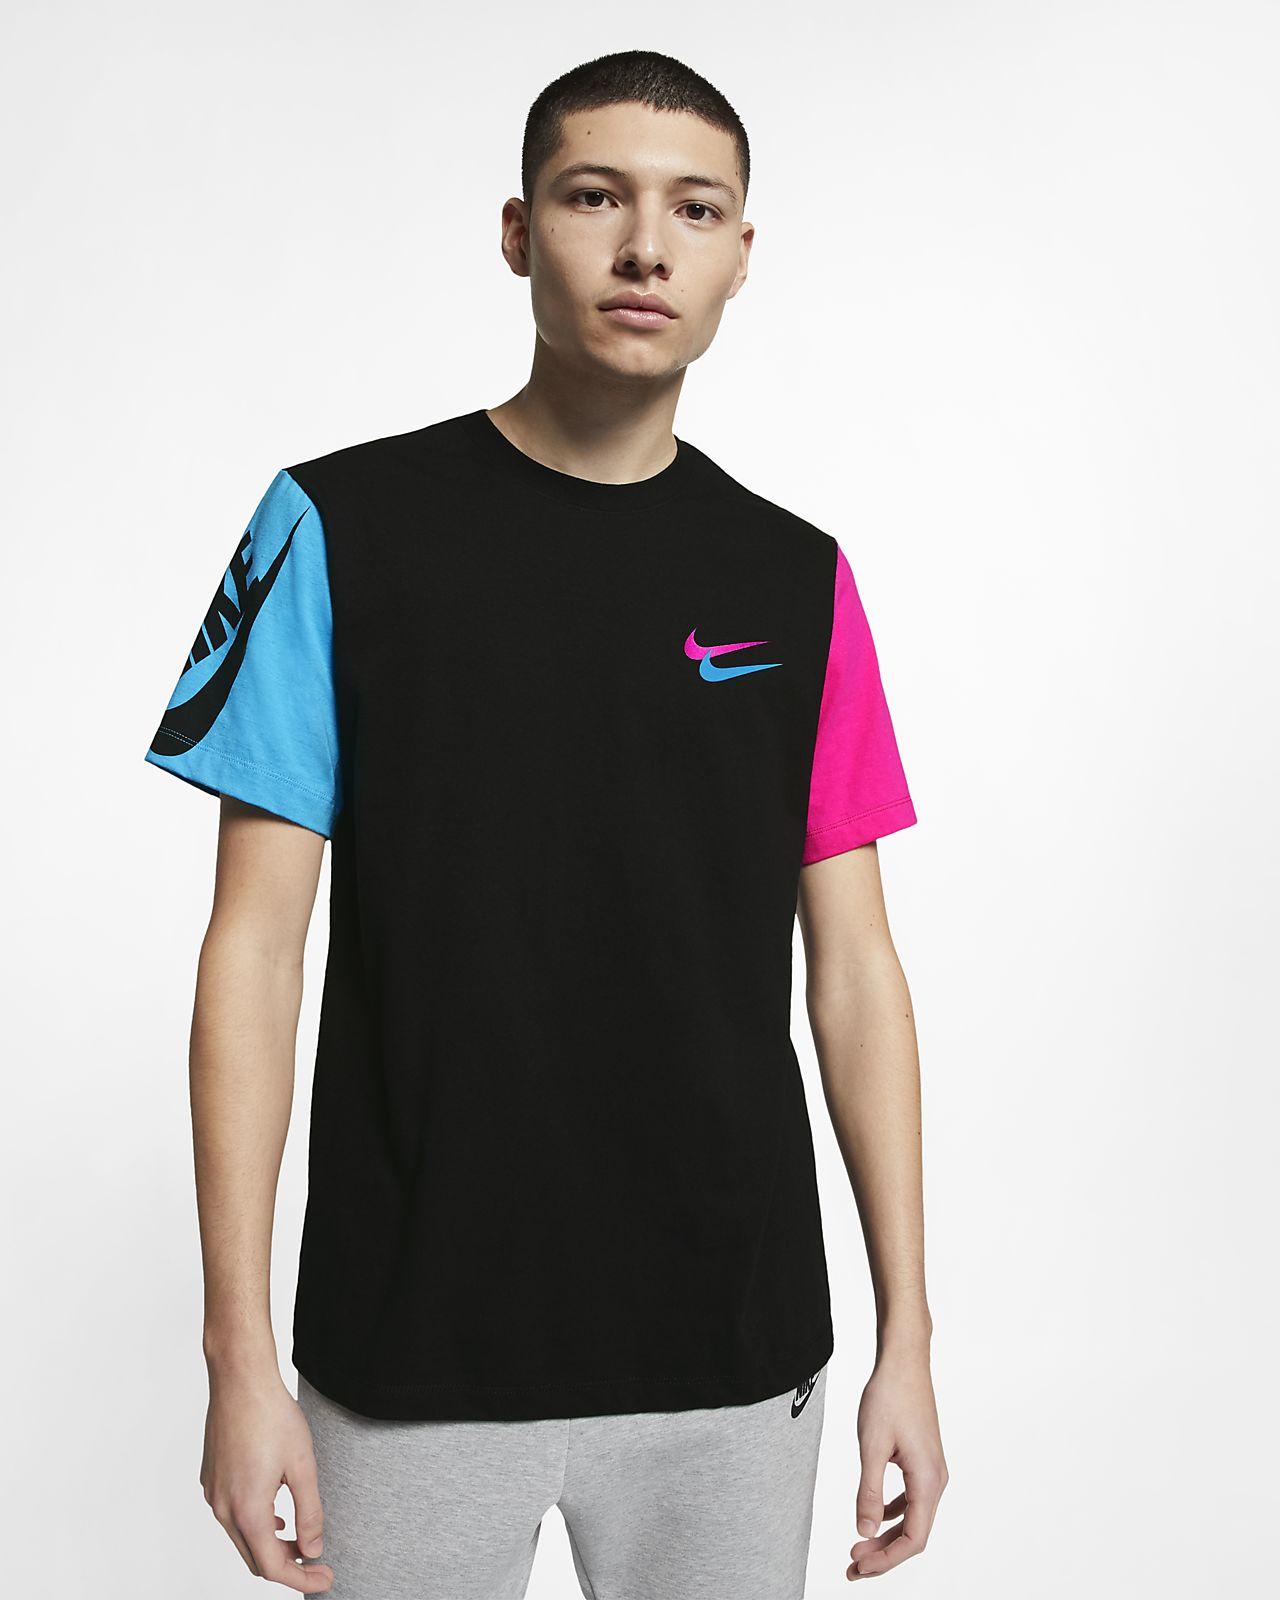 Nike Sportswear Men s T-Shirt. Nike.com 01edf2295